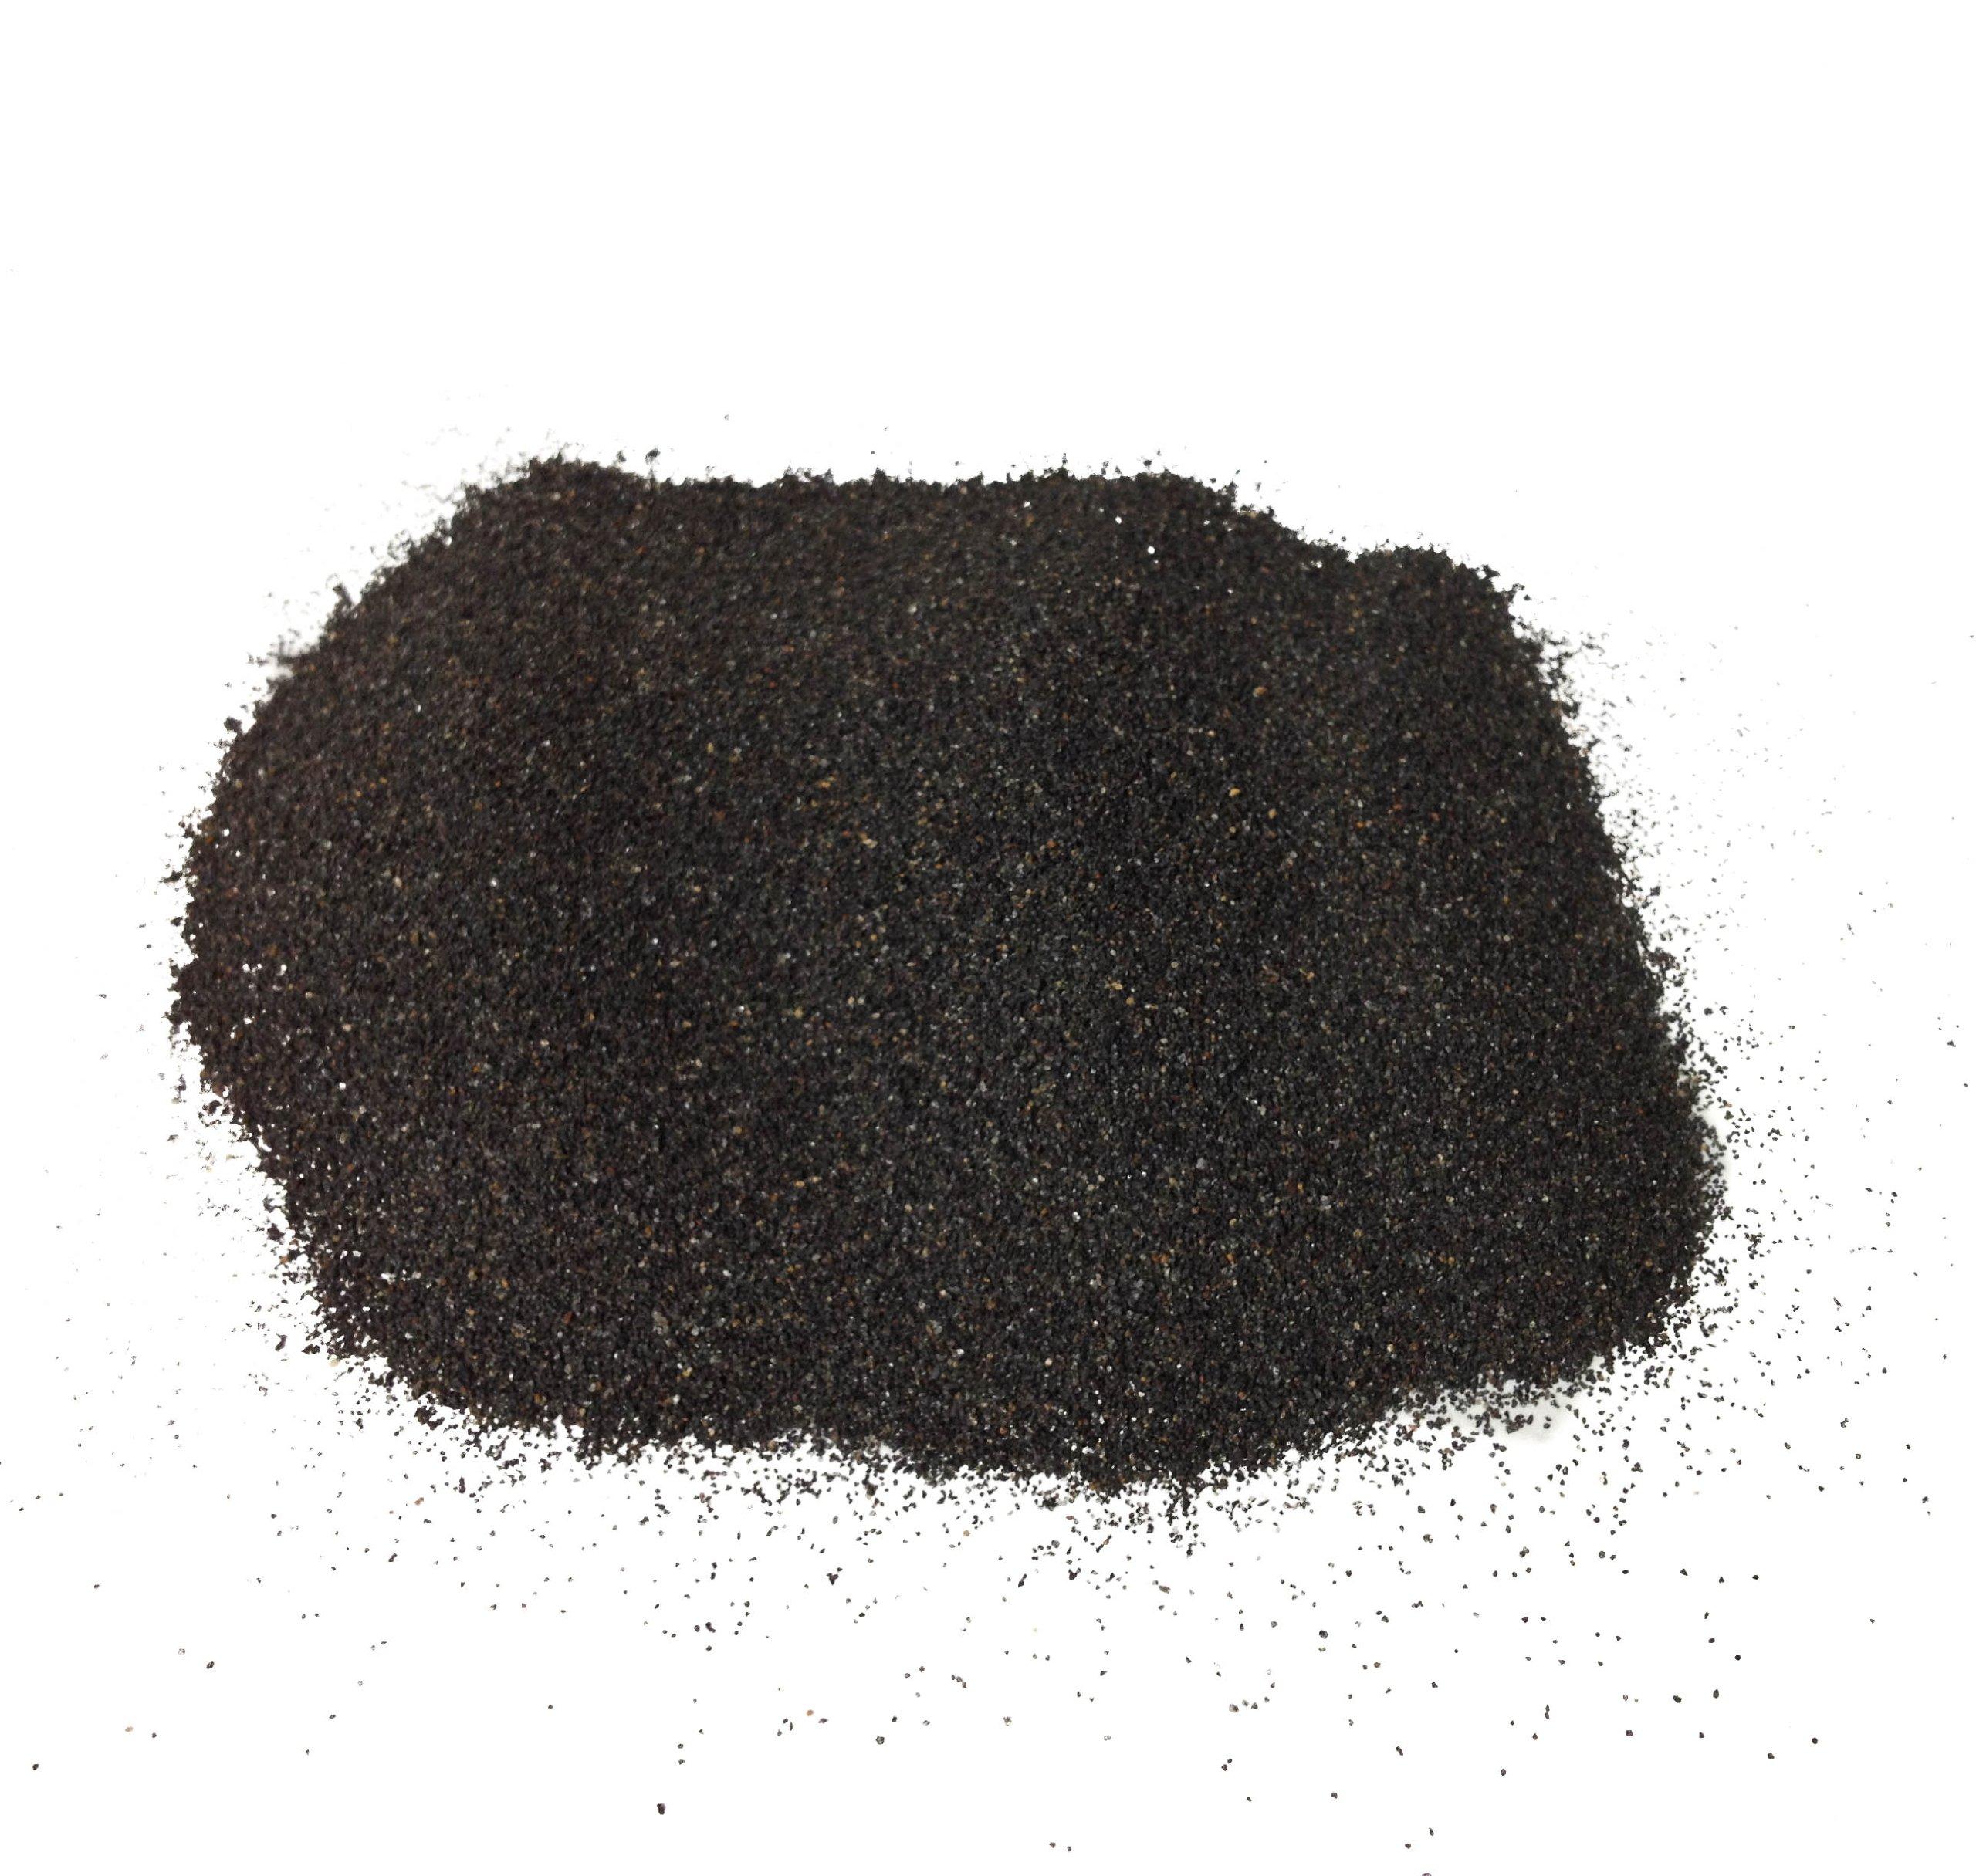 Nakpunar 1 Lb Emery Sand Powder to Fill Pin Cushions - Make Your Own Abrasive Pincushions by Nakpunar